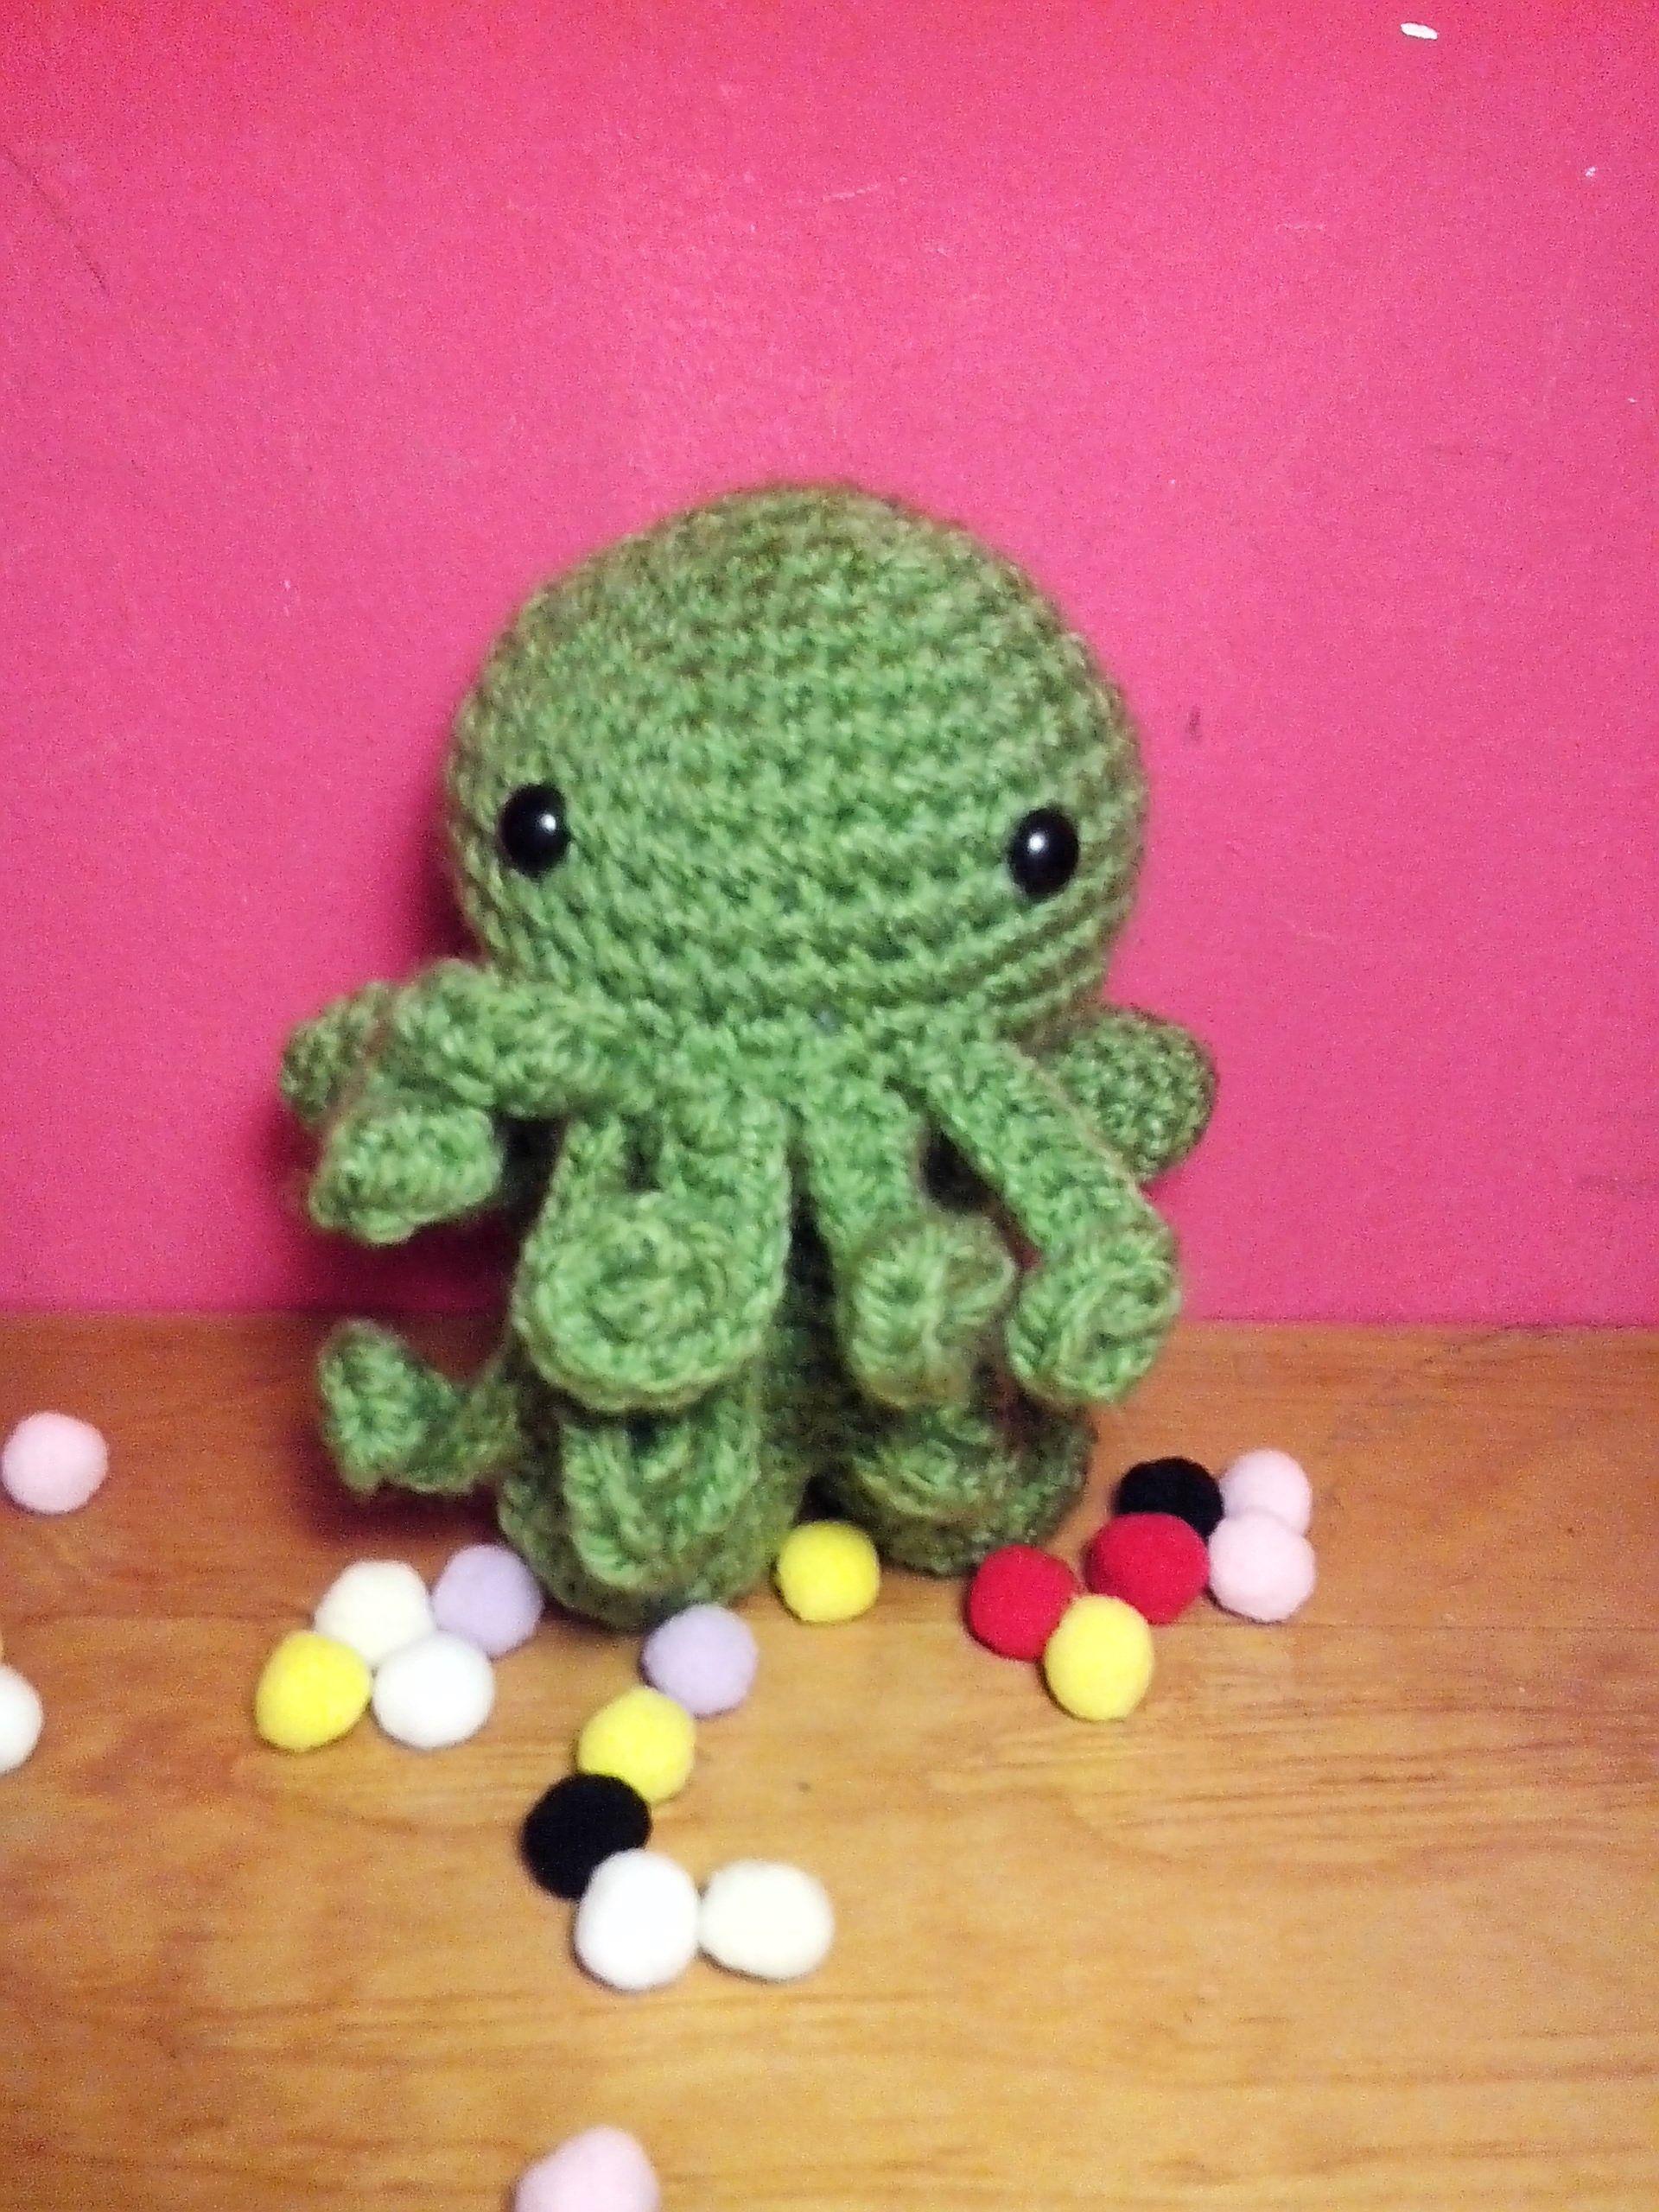 crochet cthulhu amigurumi Lovecraft universe | PATAPOUF | Pinterest